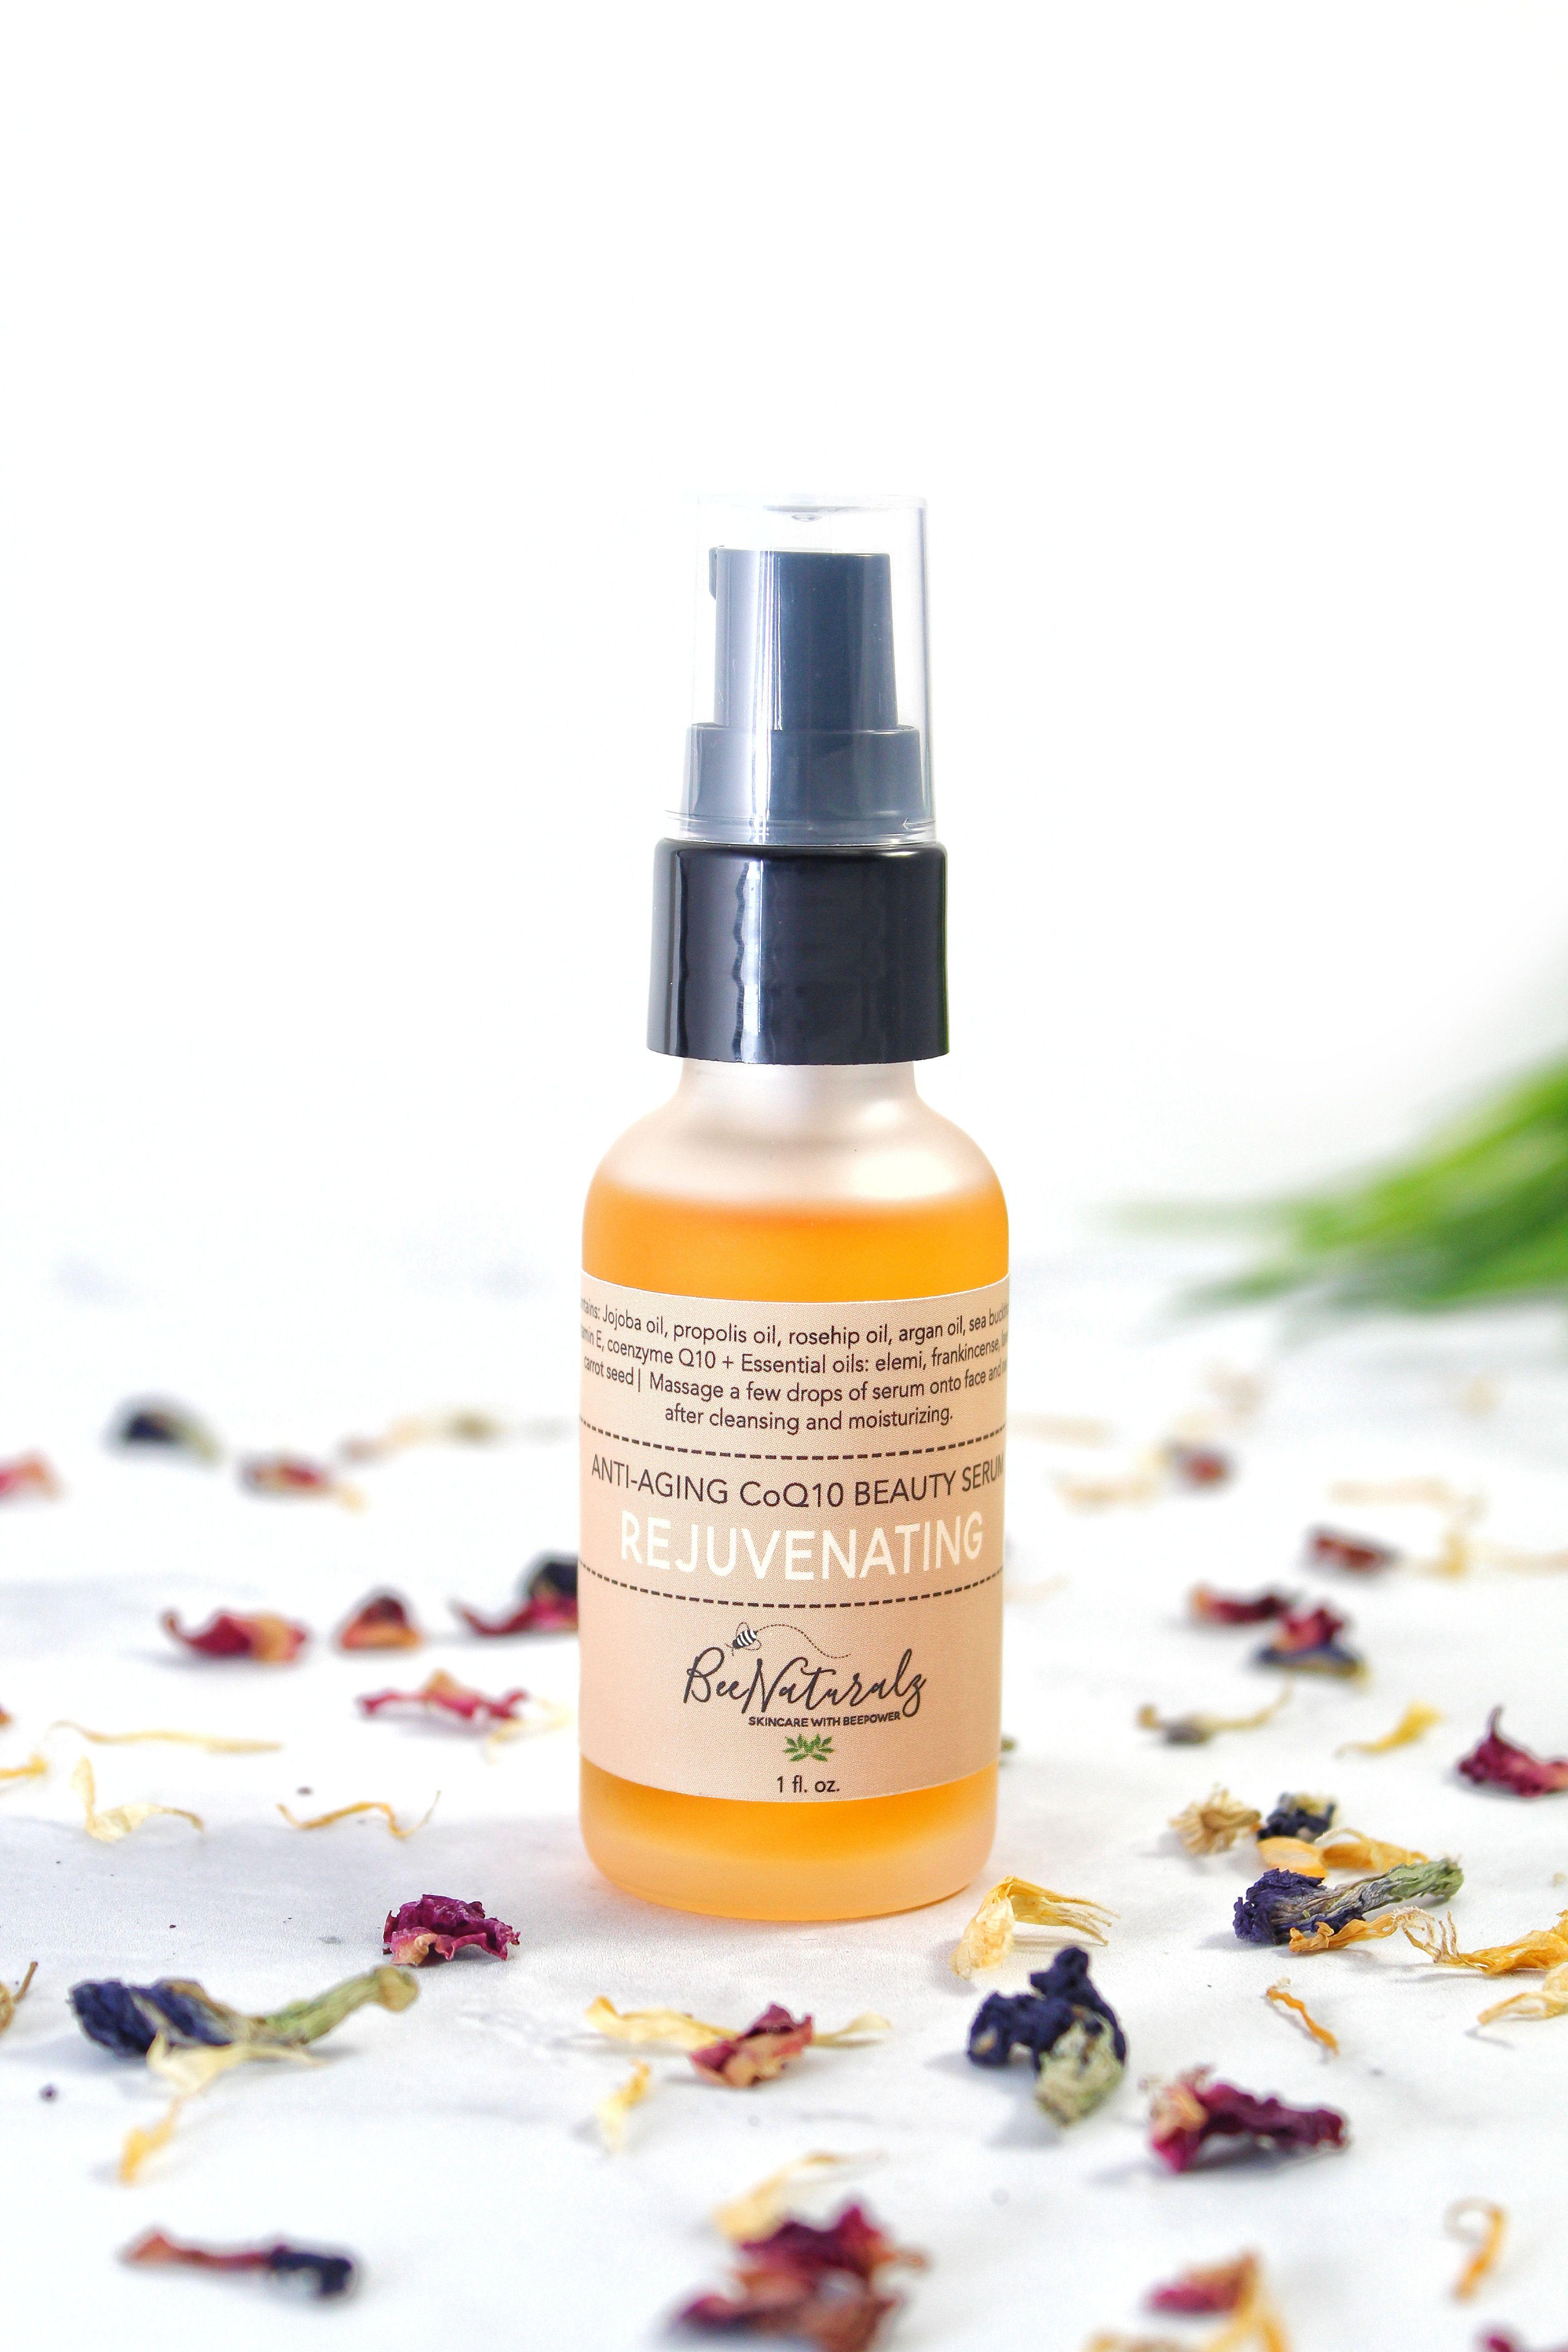 AntiAging CoQ10 Beauty Serum Rejuvenating Beauty